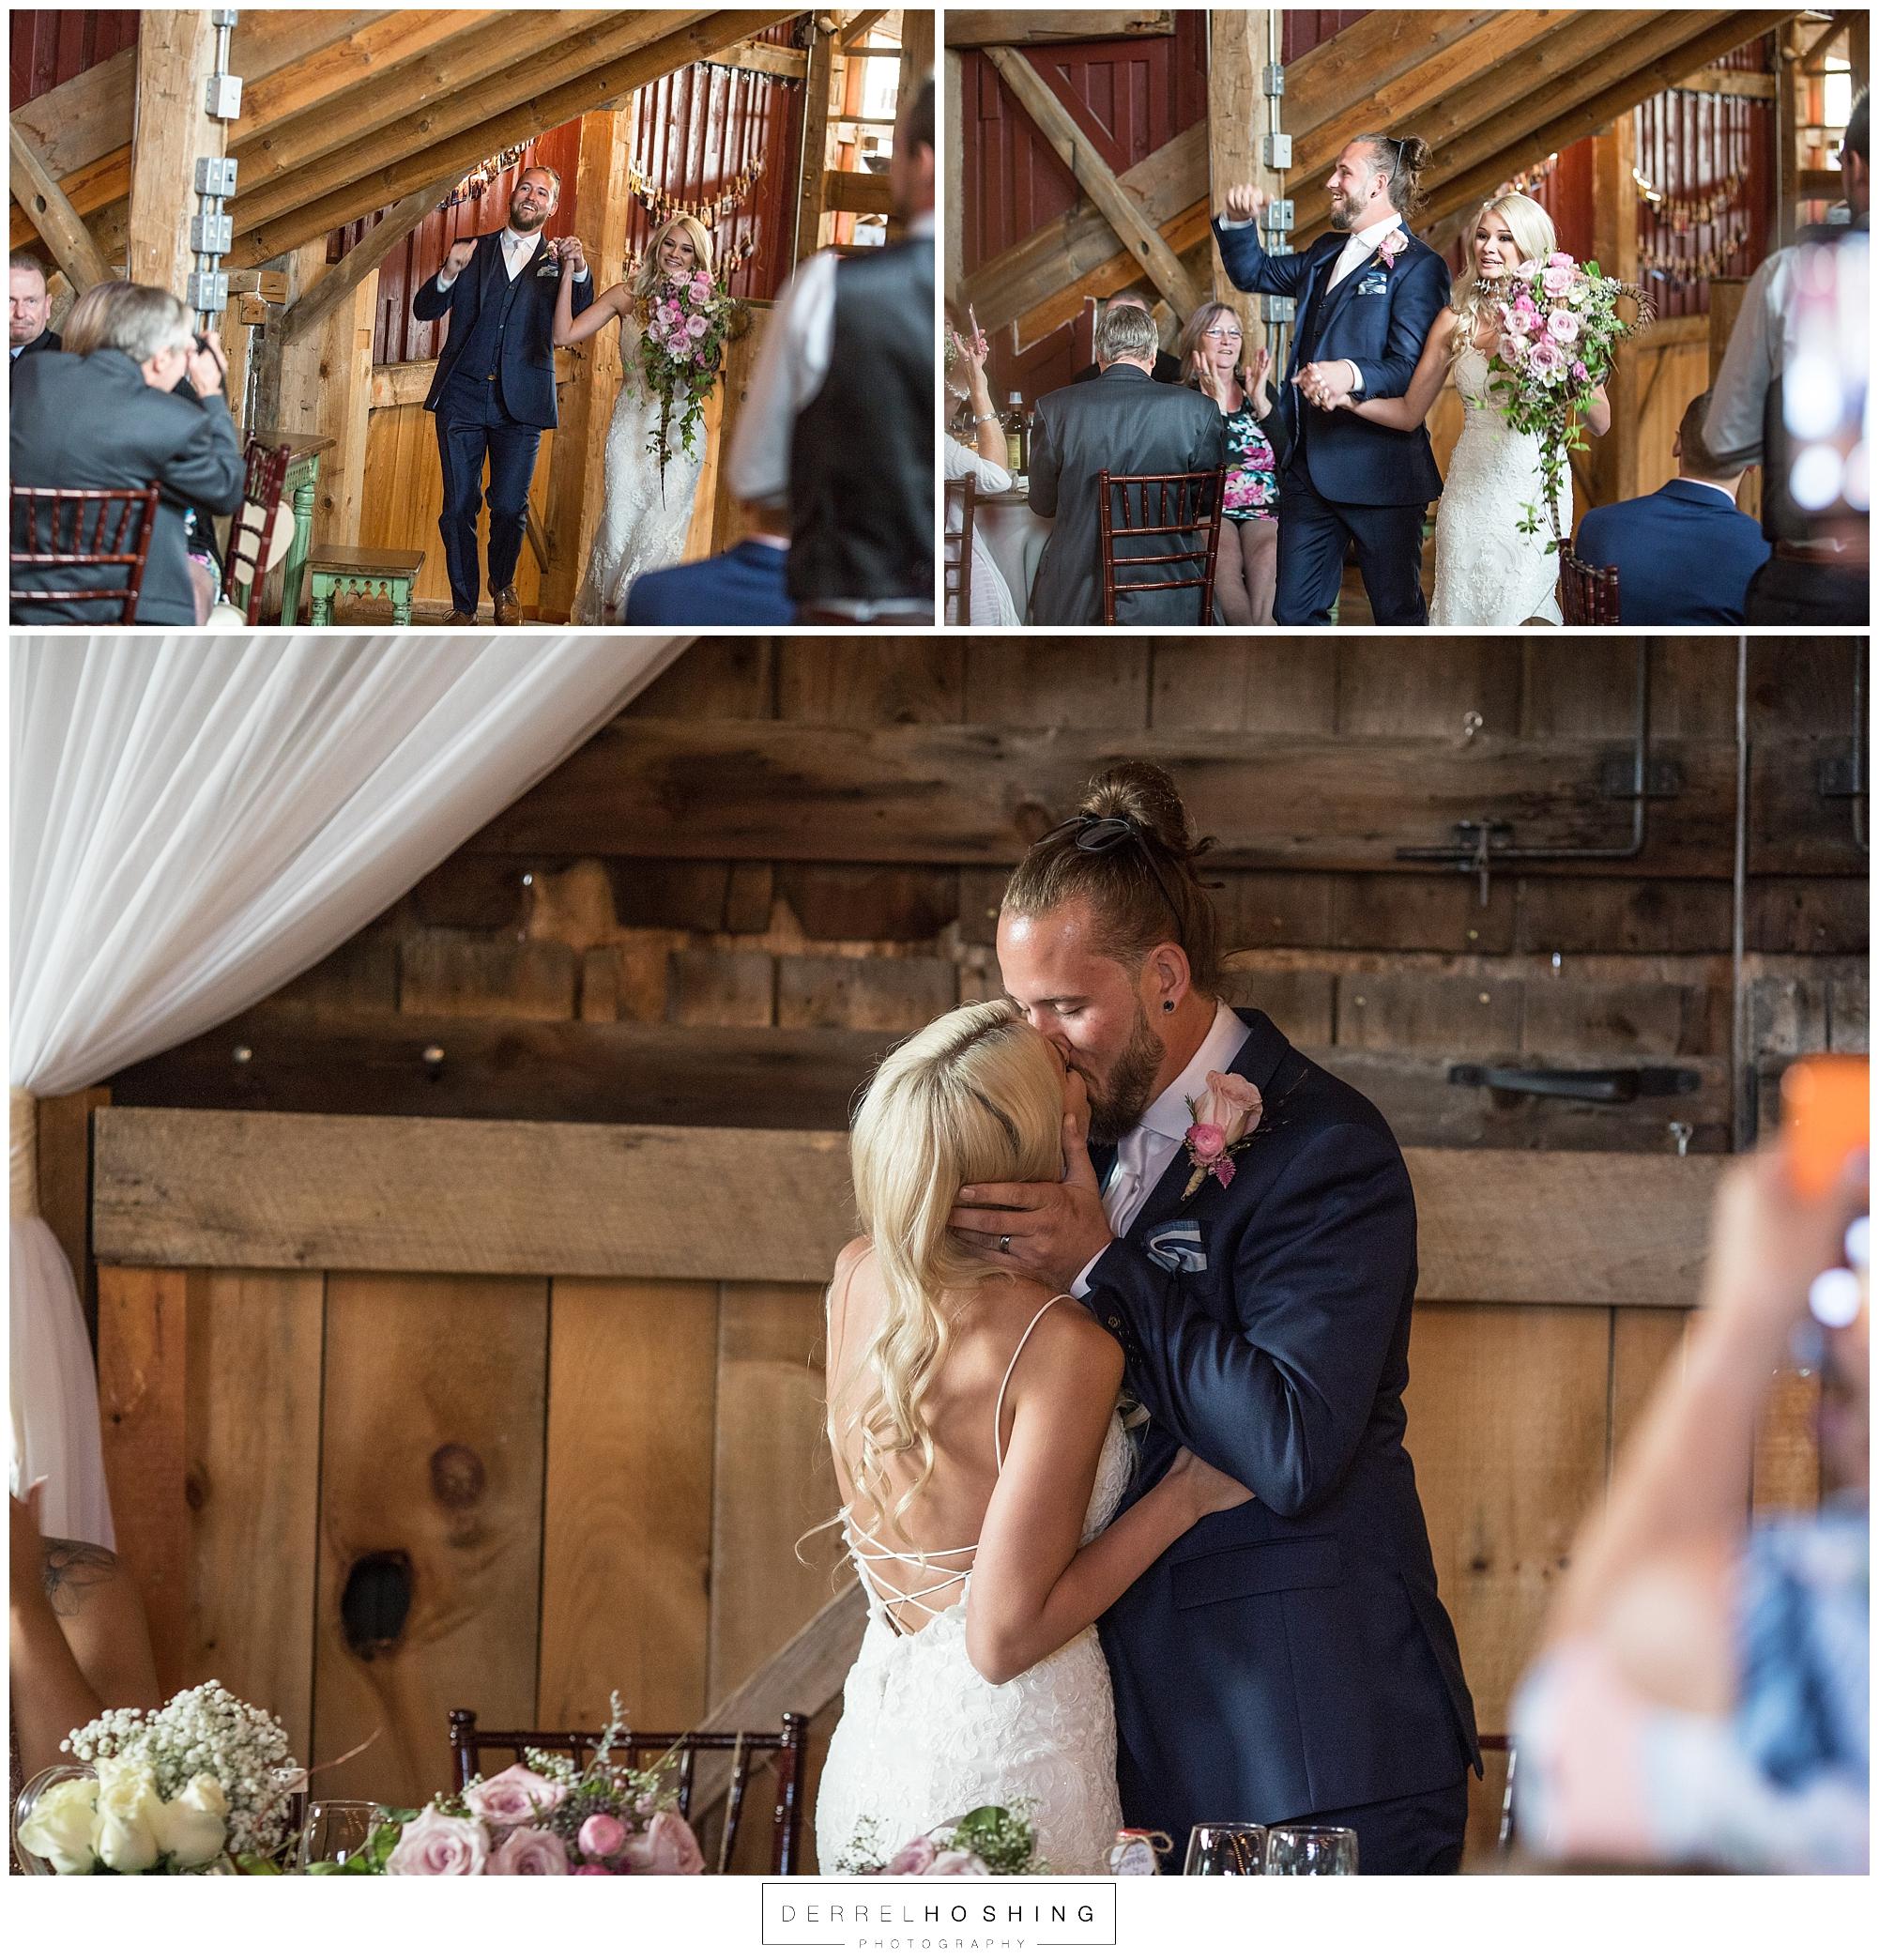 Belcroft-Estates-&-Event-Centre-Wedding-Innisfil-Ontario-0030.jpg